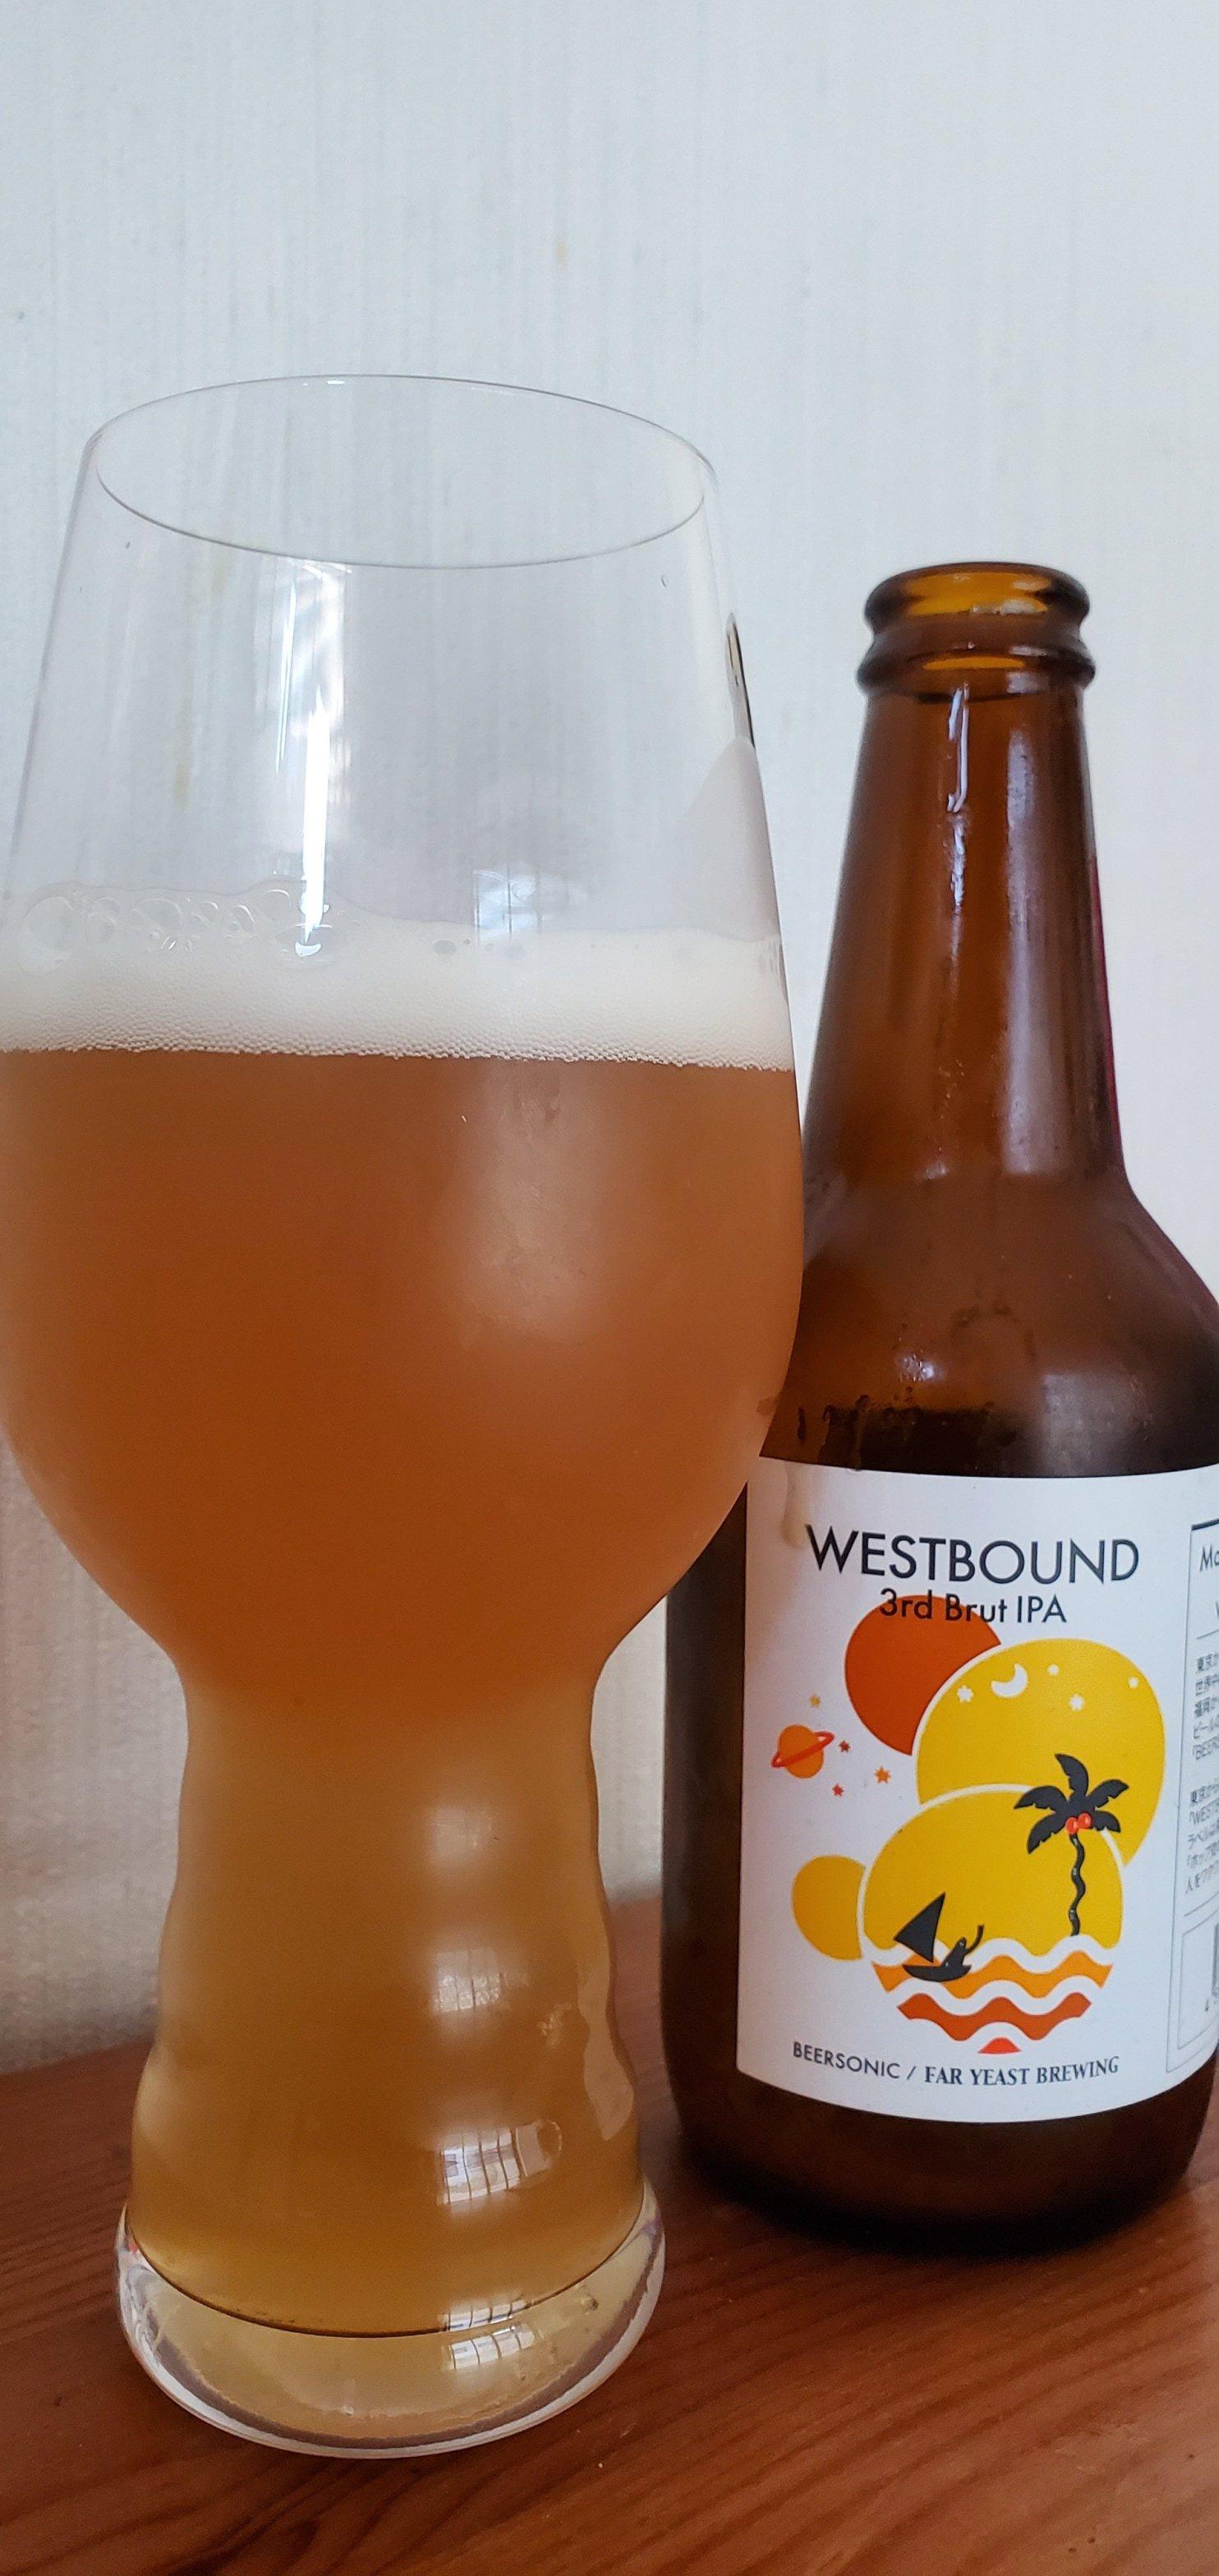 Far Yeast Westbound 3rd Brut IPA・ファーイースト ウエストバウンド サード ブリュットアイピーエー